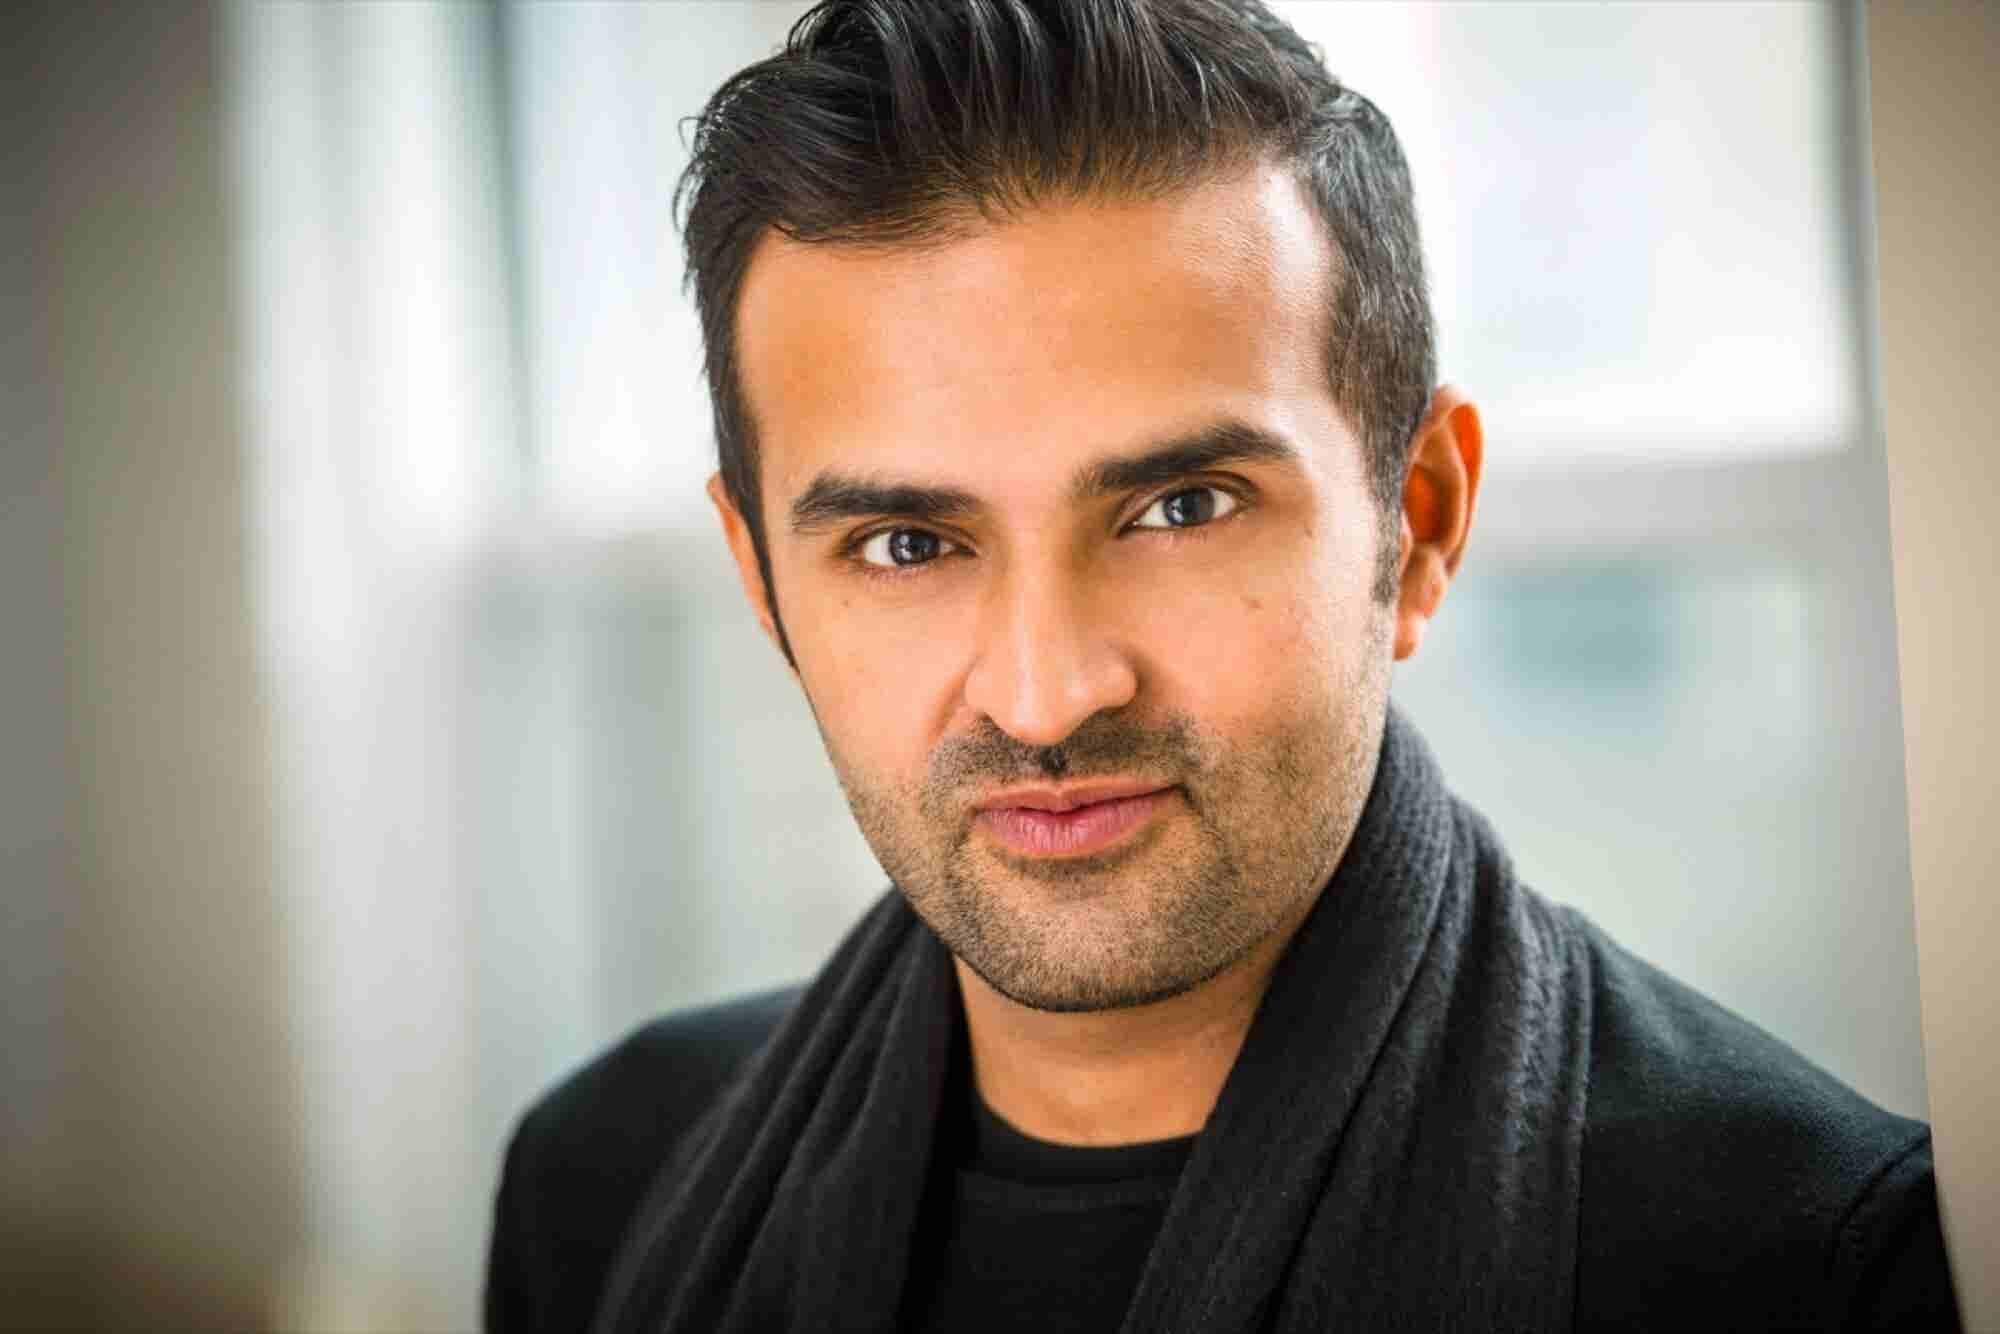 U.N. Foundation Taps Ashish Thakkar to Channel His Entrepreneurial Expertise Towards Humanitarianism